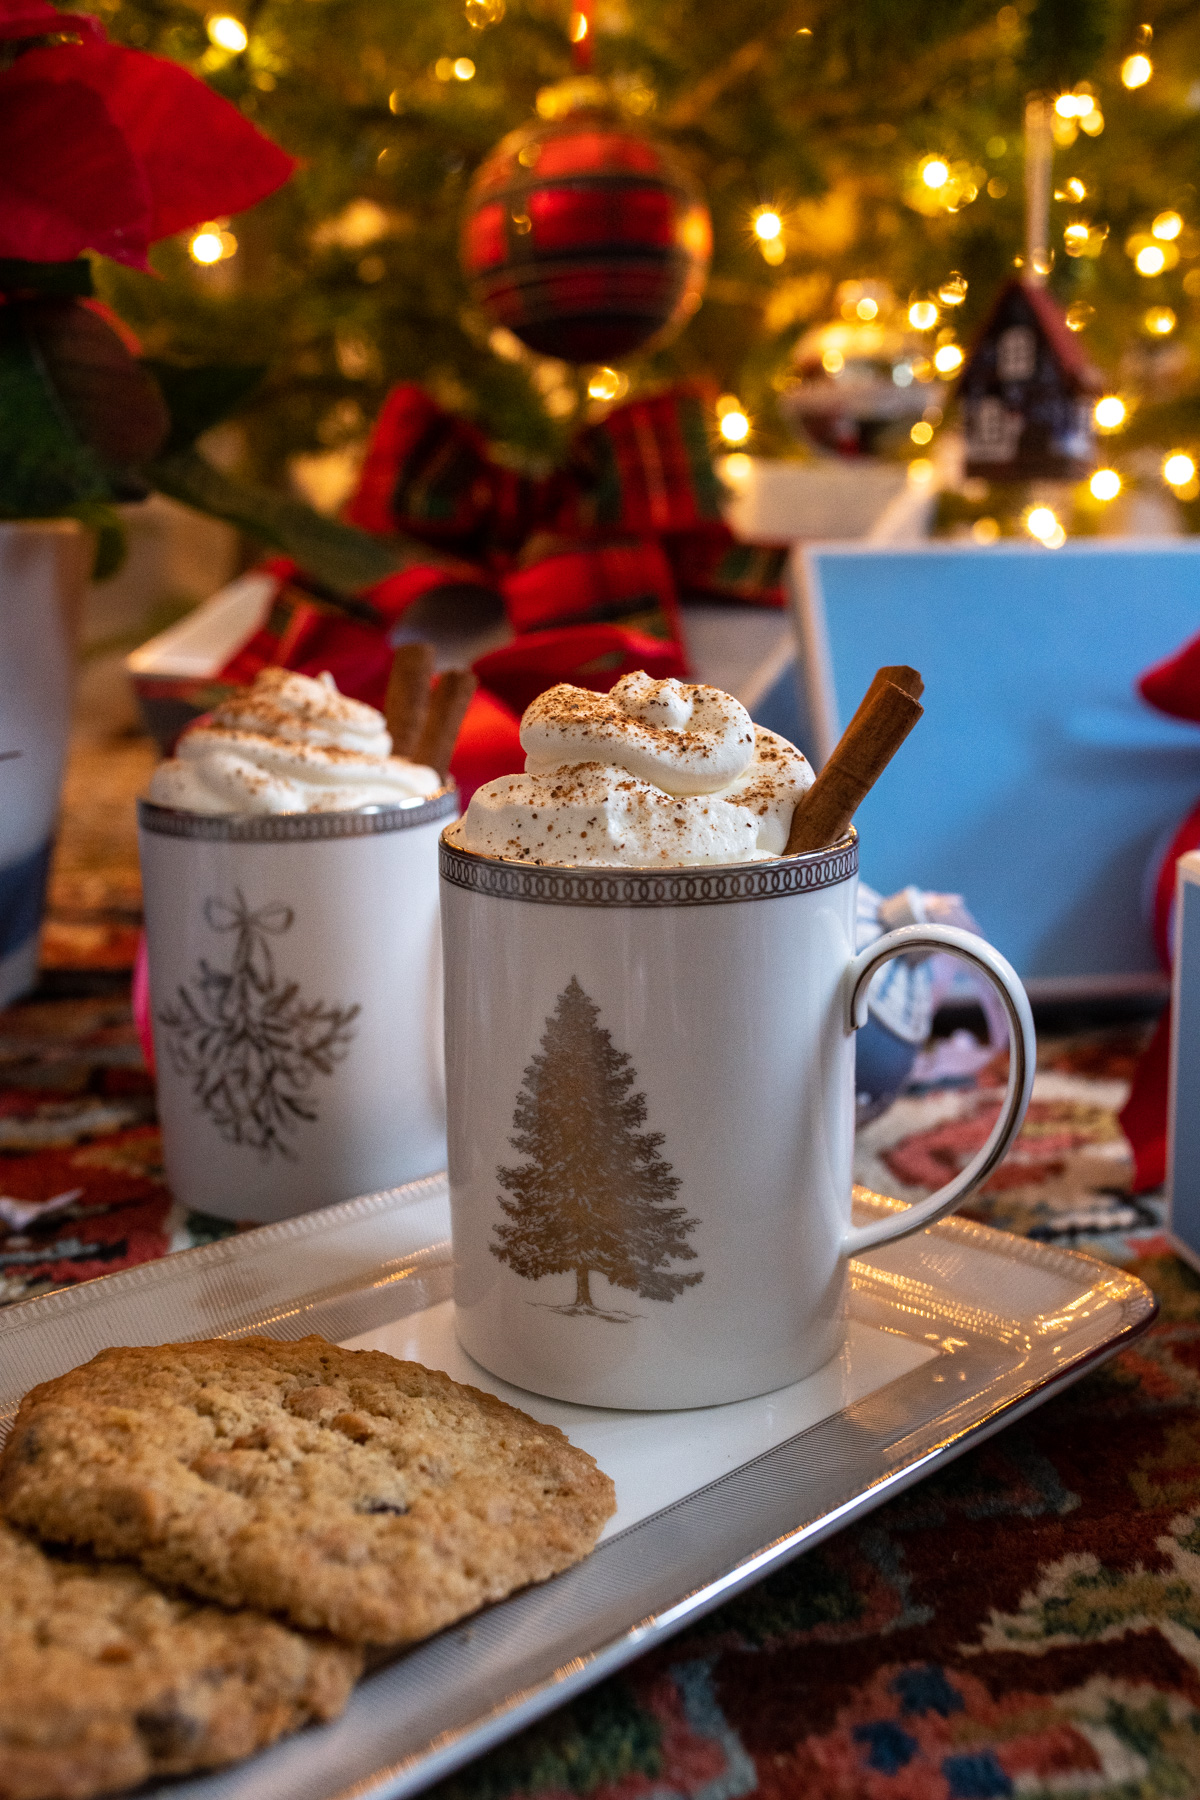 Stacie Flinner x New England Holiday Decorations-4.jpg